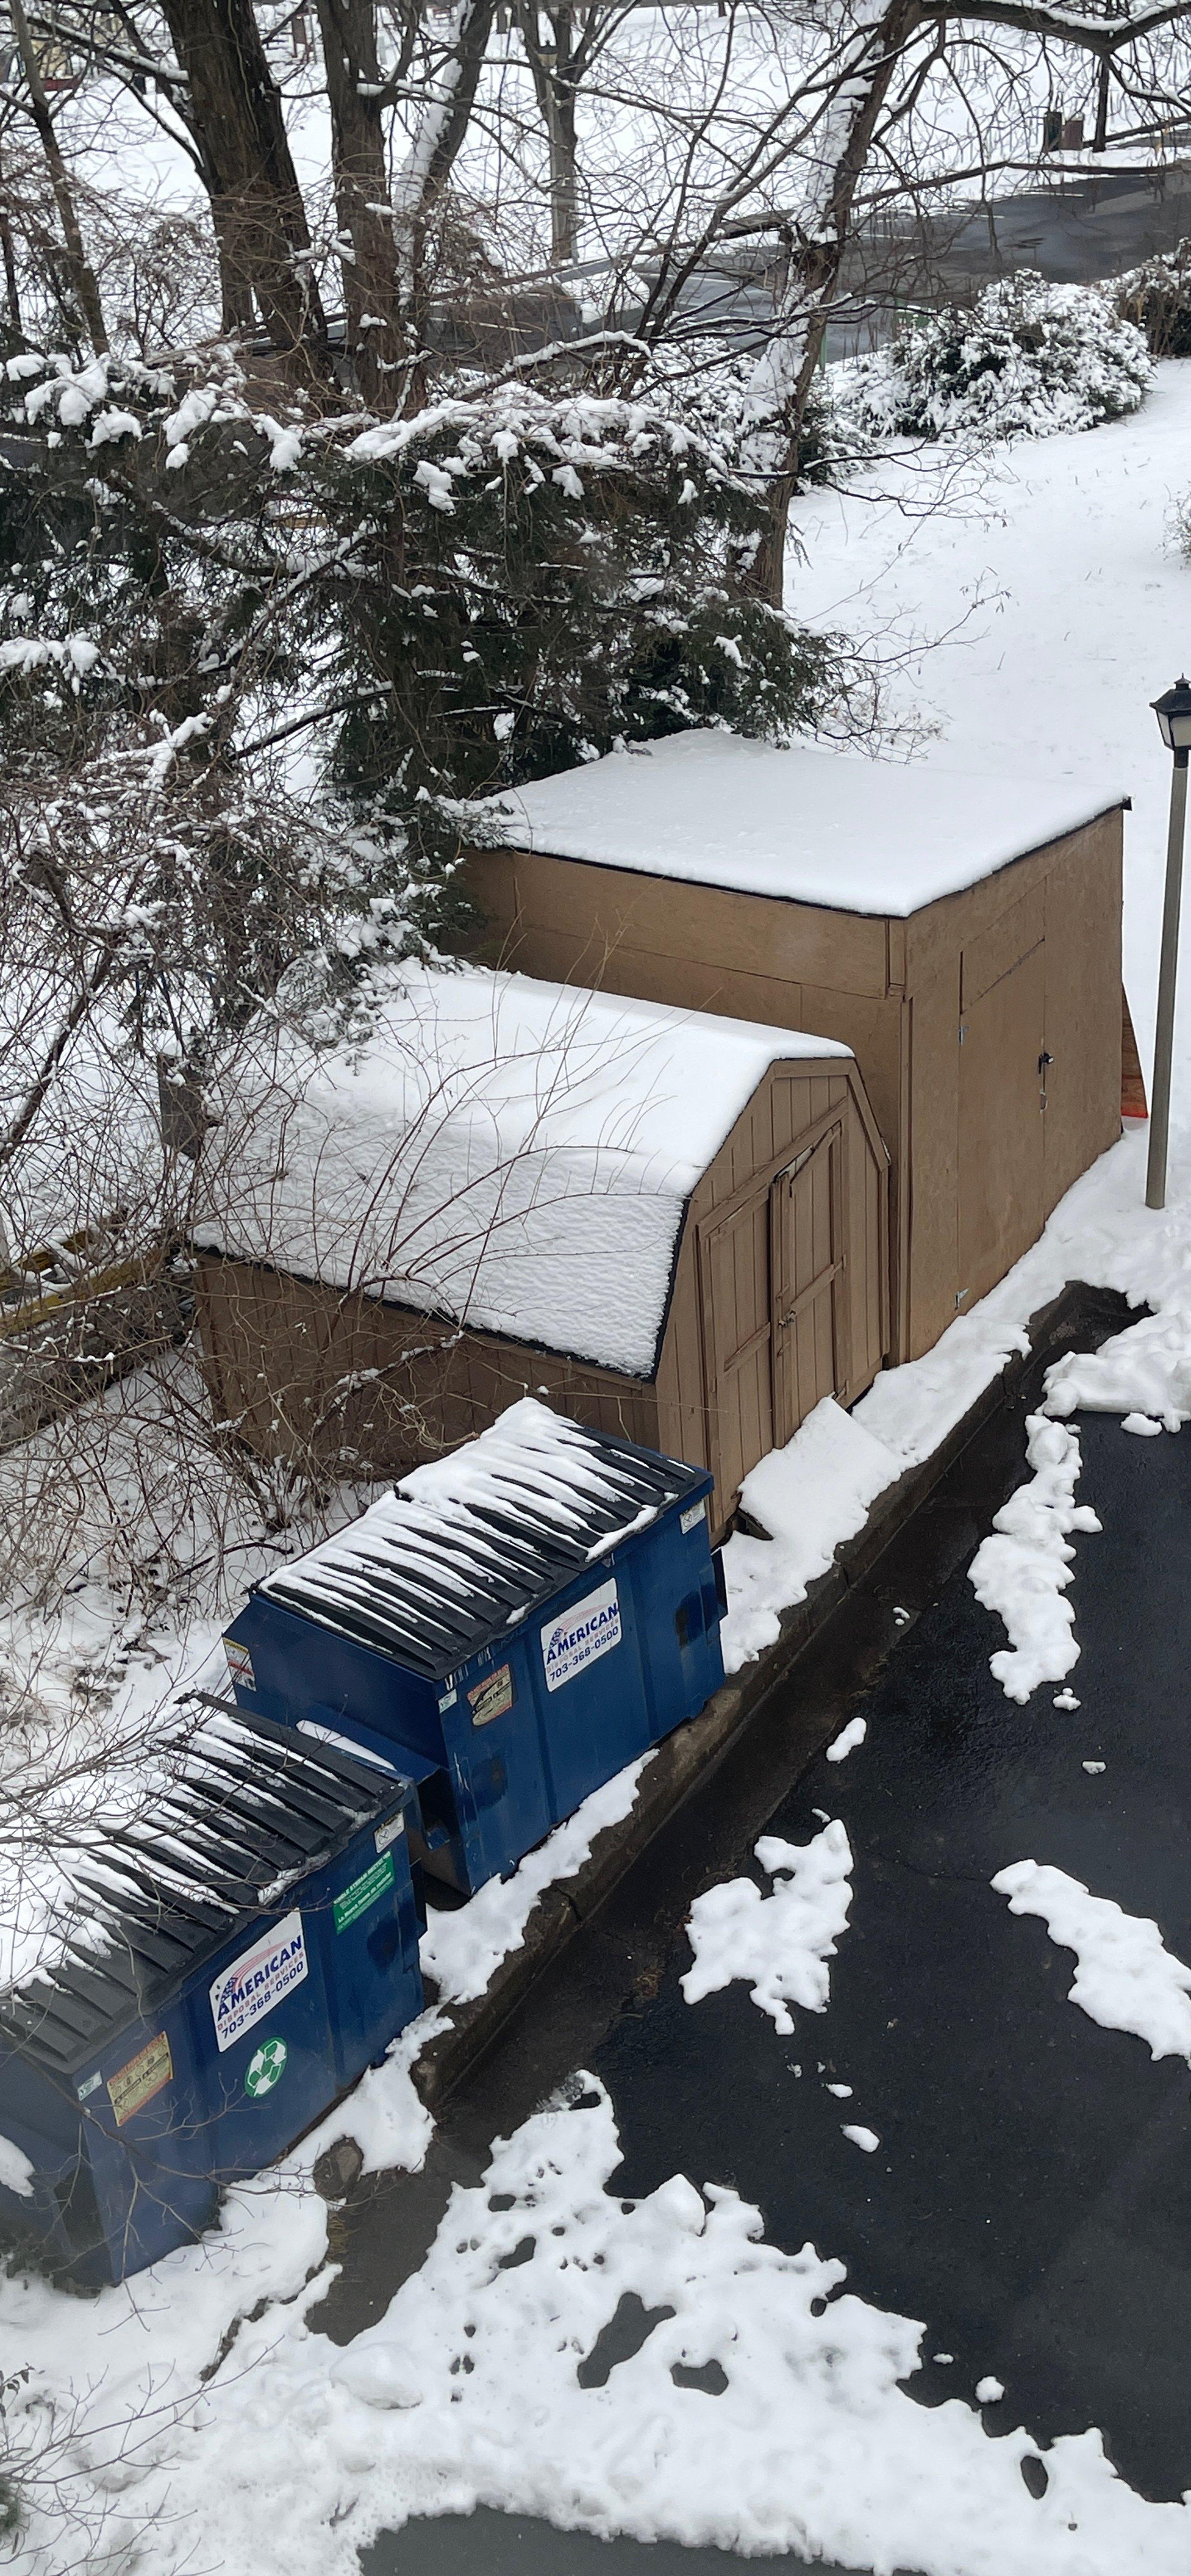 12x12 Parking Lot self storage unit